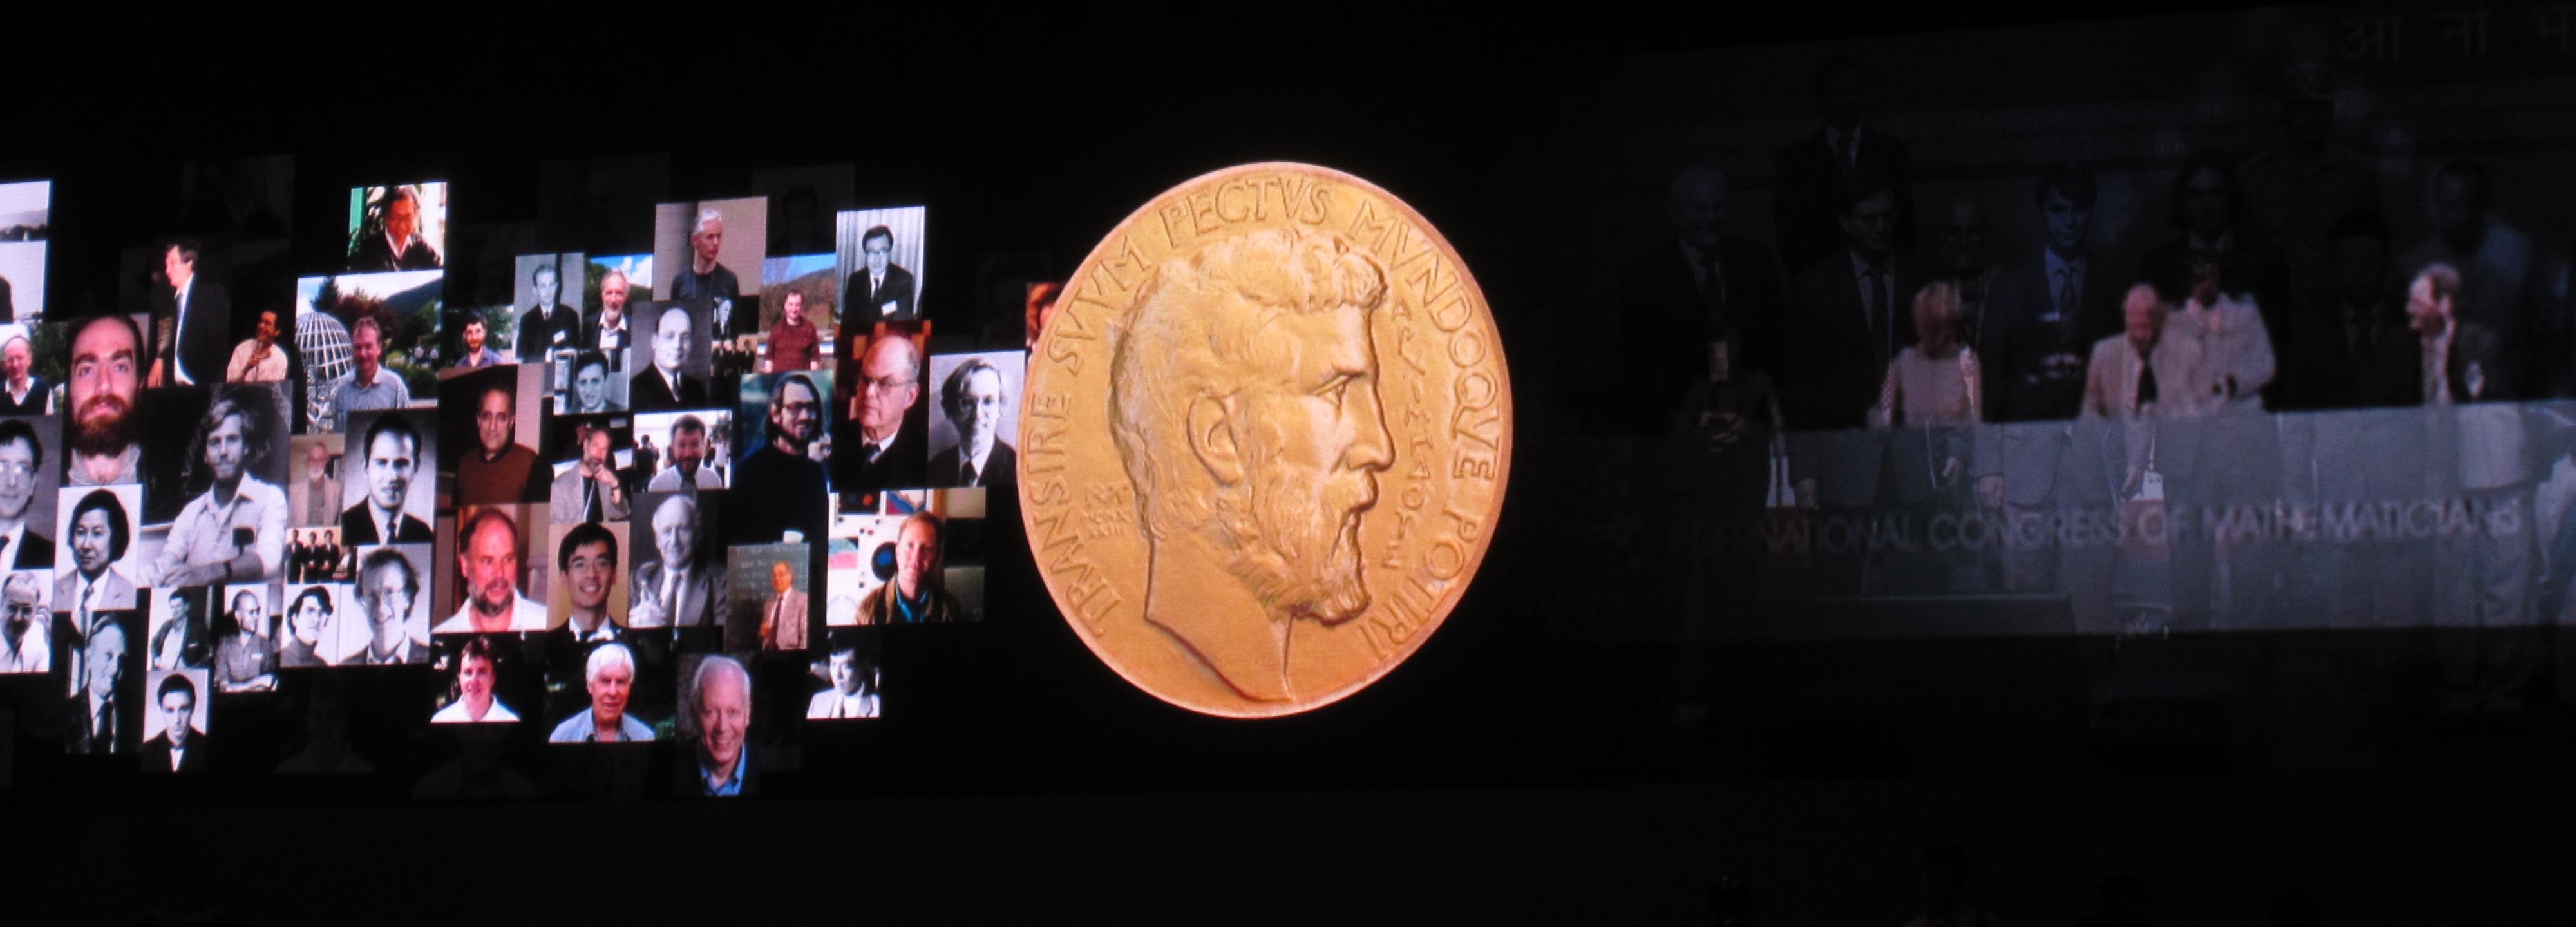 Філдсовська медаль